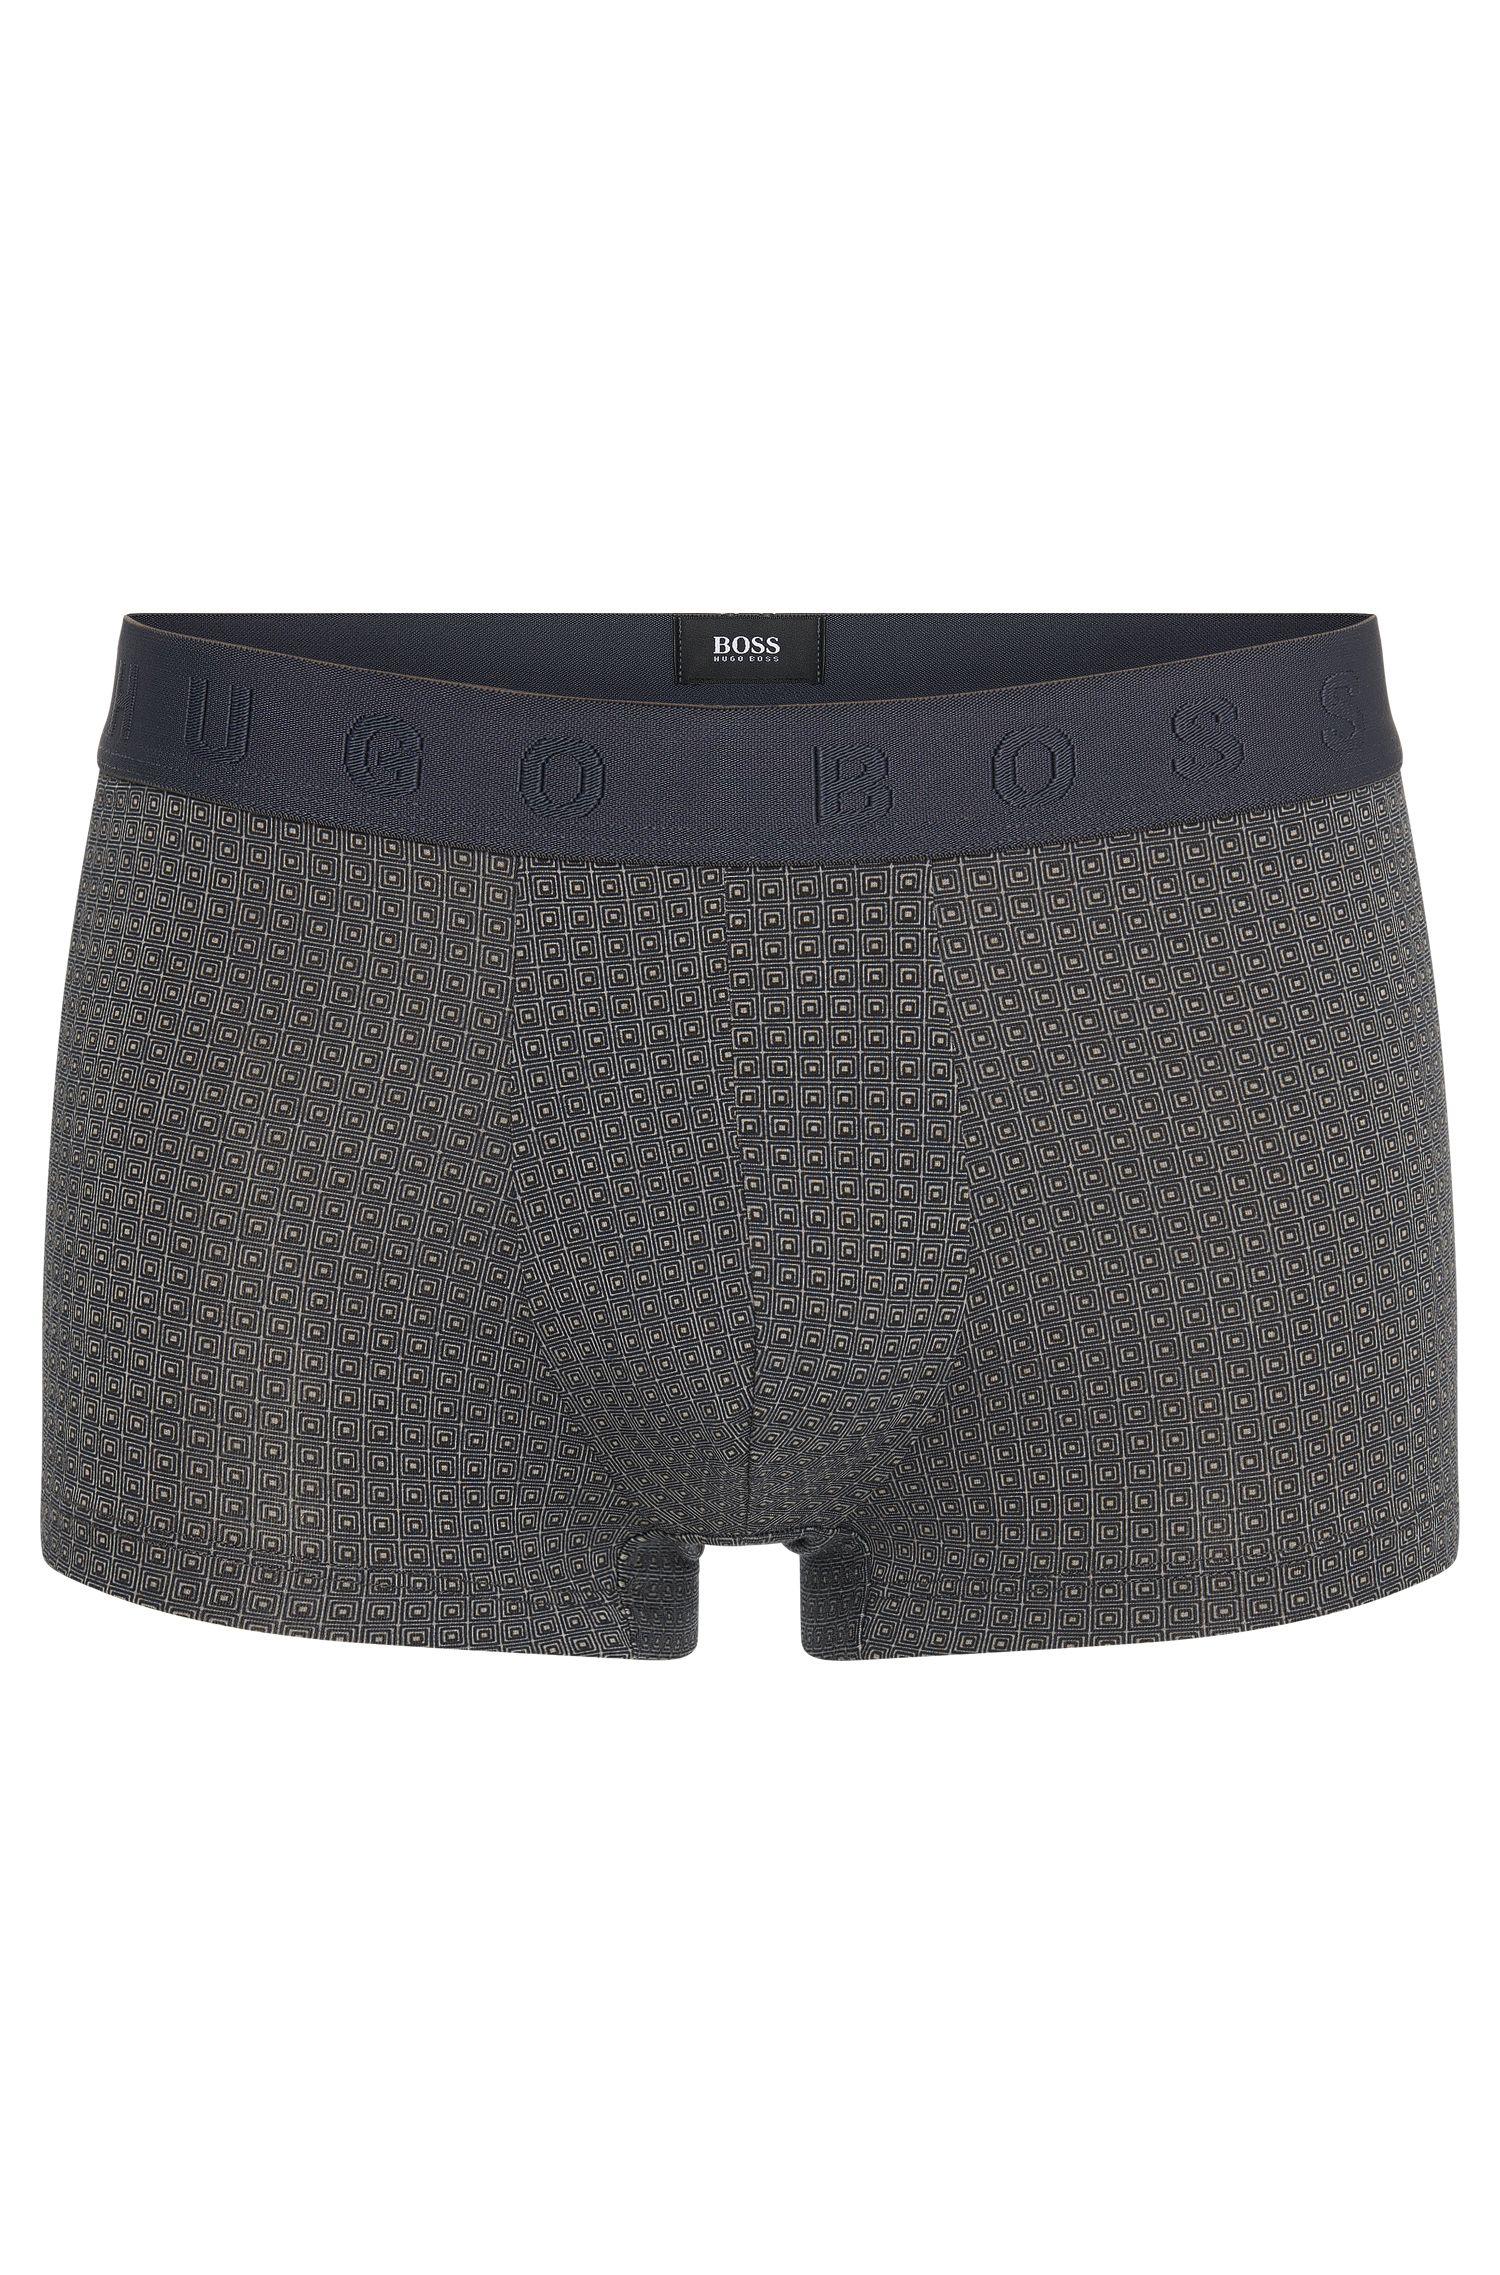 Calzoncillos boxer con estampado integral en mezcla de algodón y modal: 'Boxer Microprint'